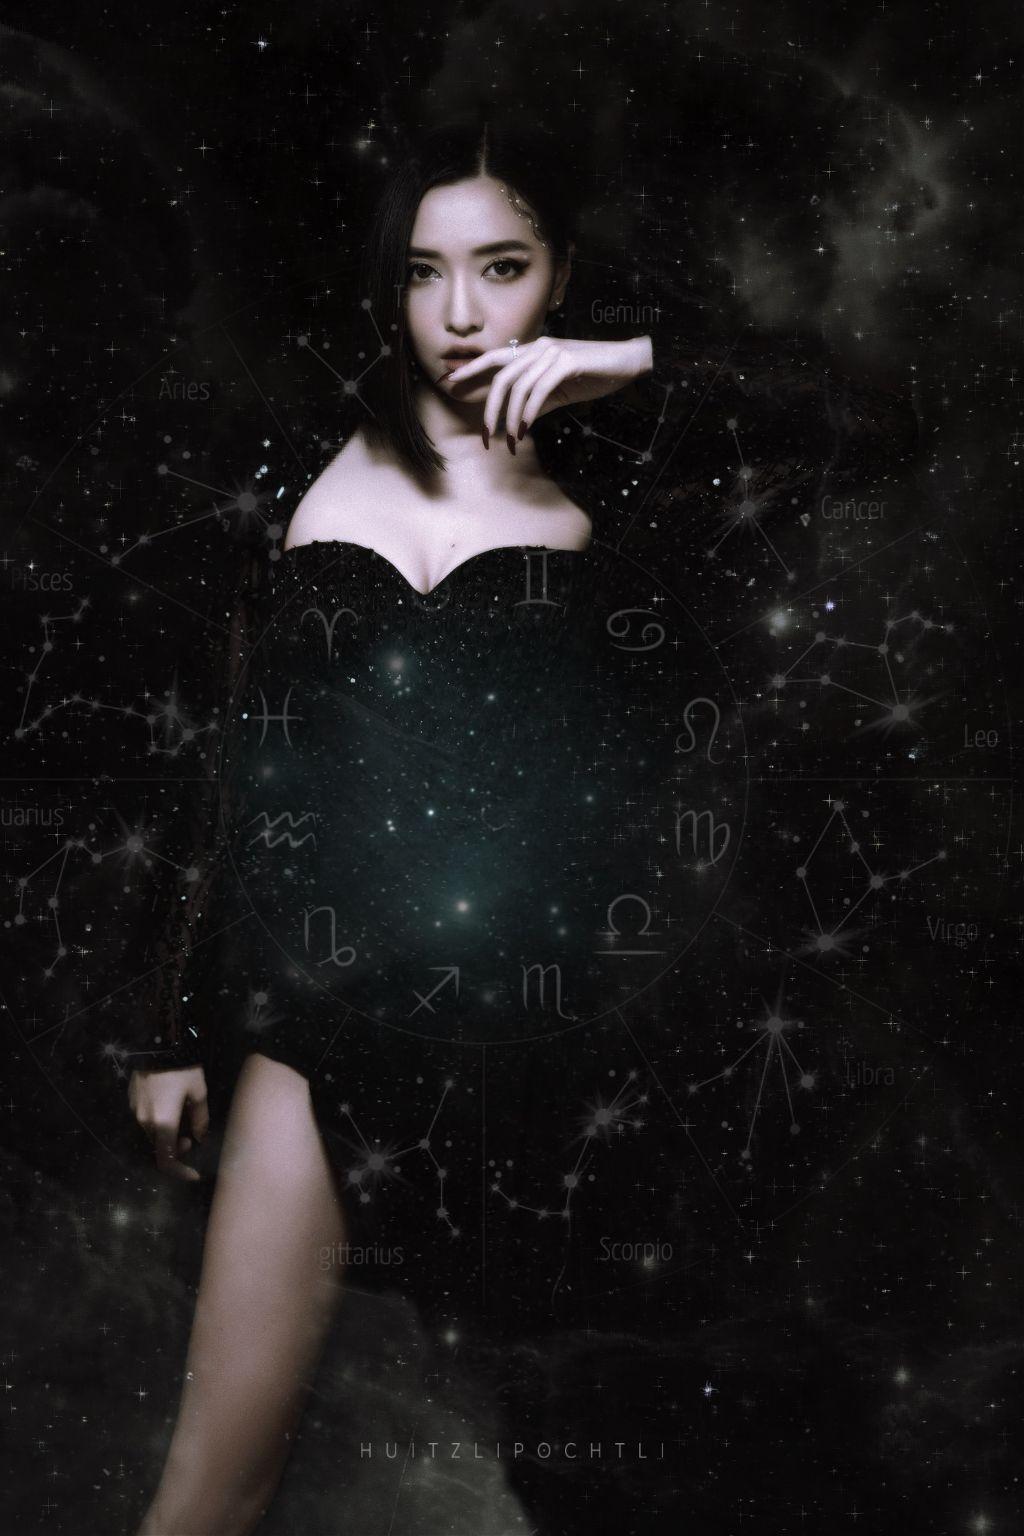 I am the Darkness   #surreal #galaxy #freetoedit